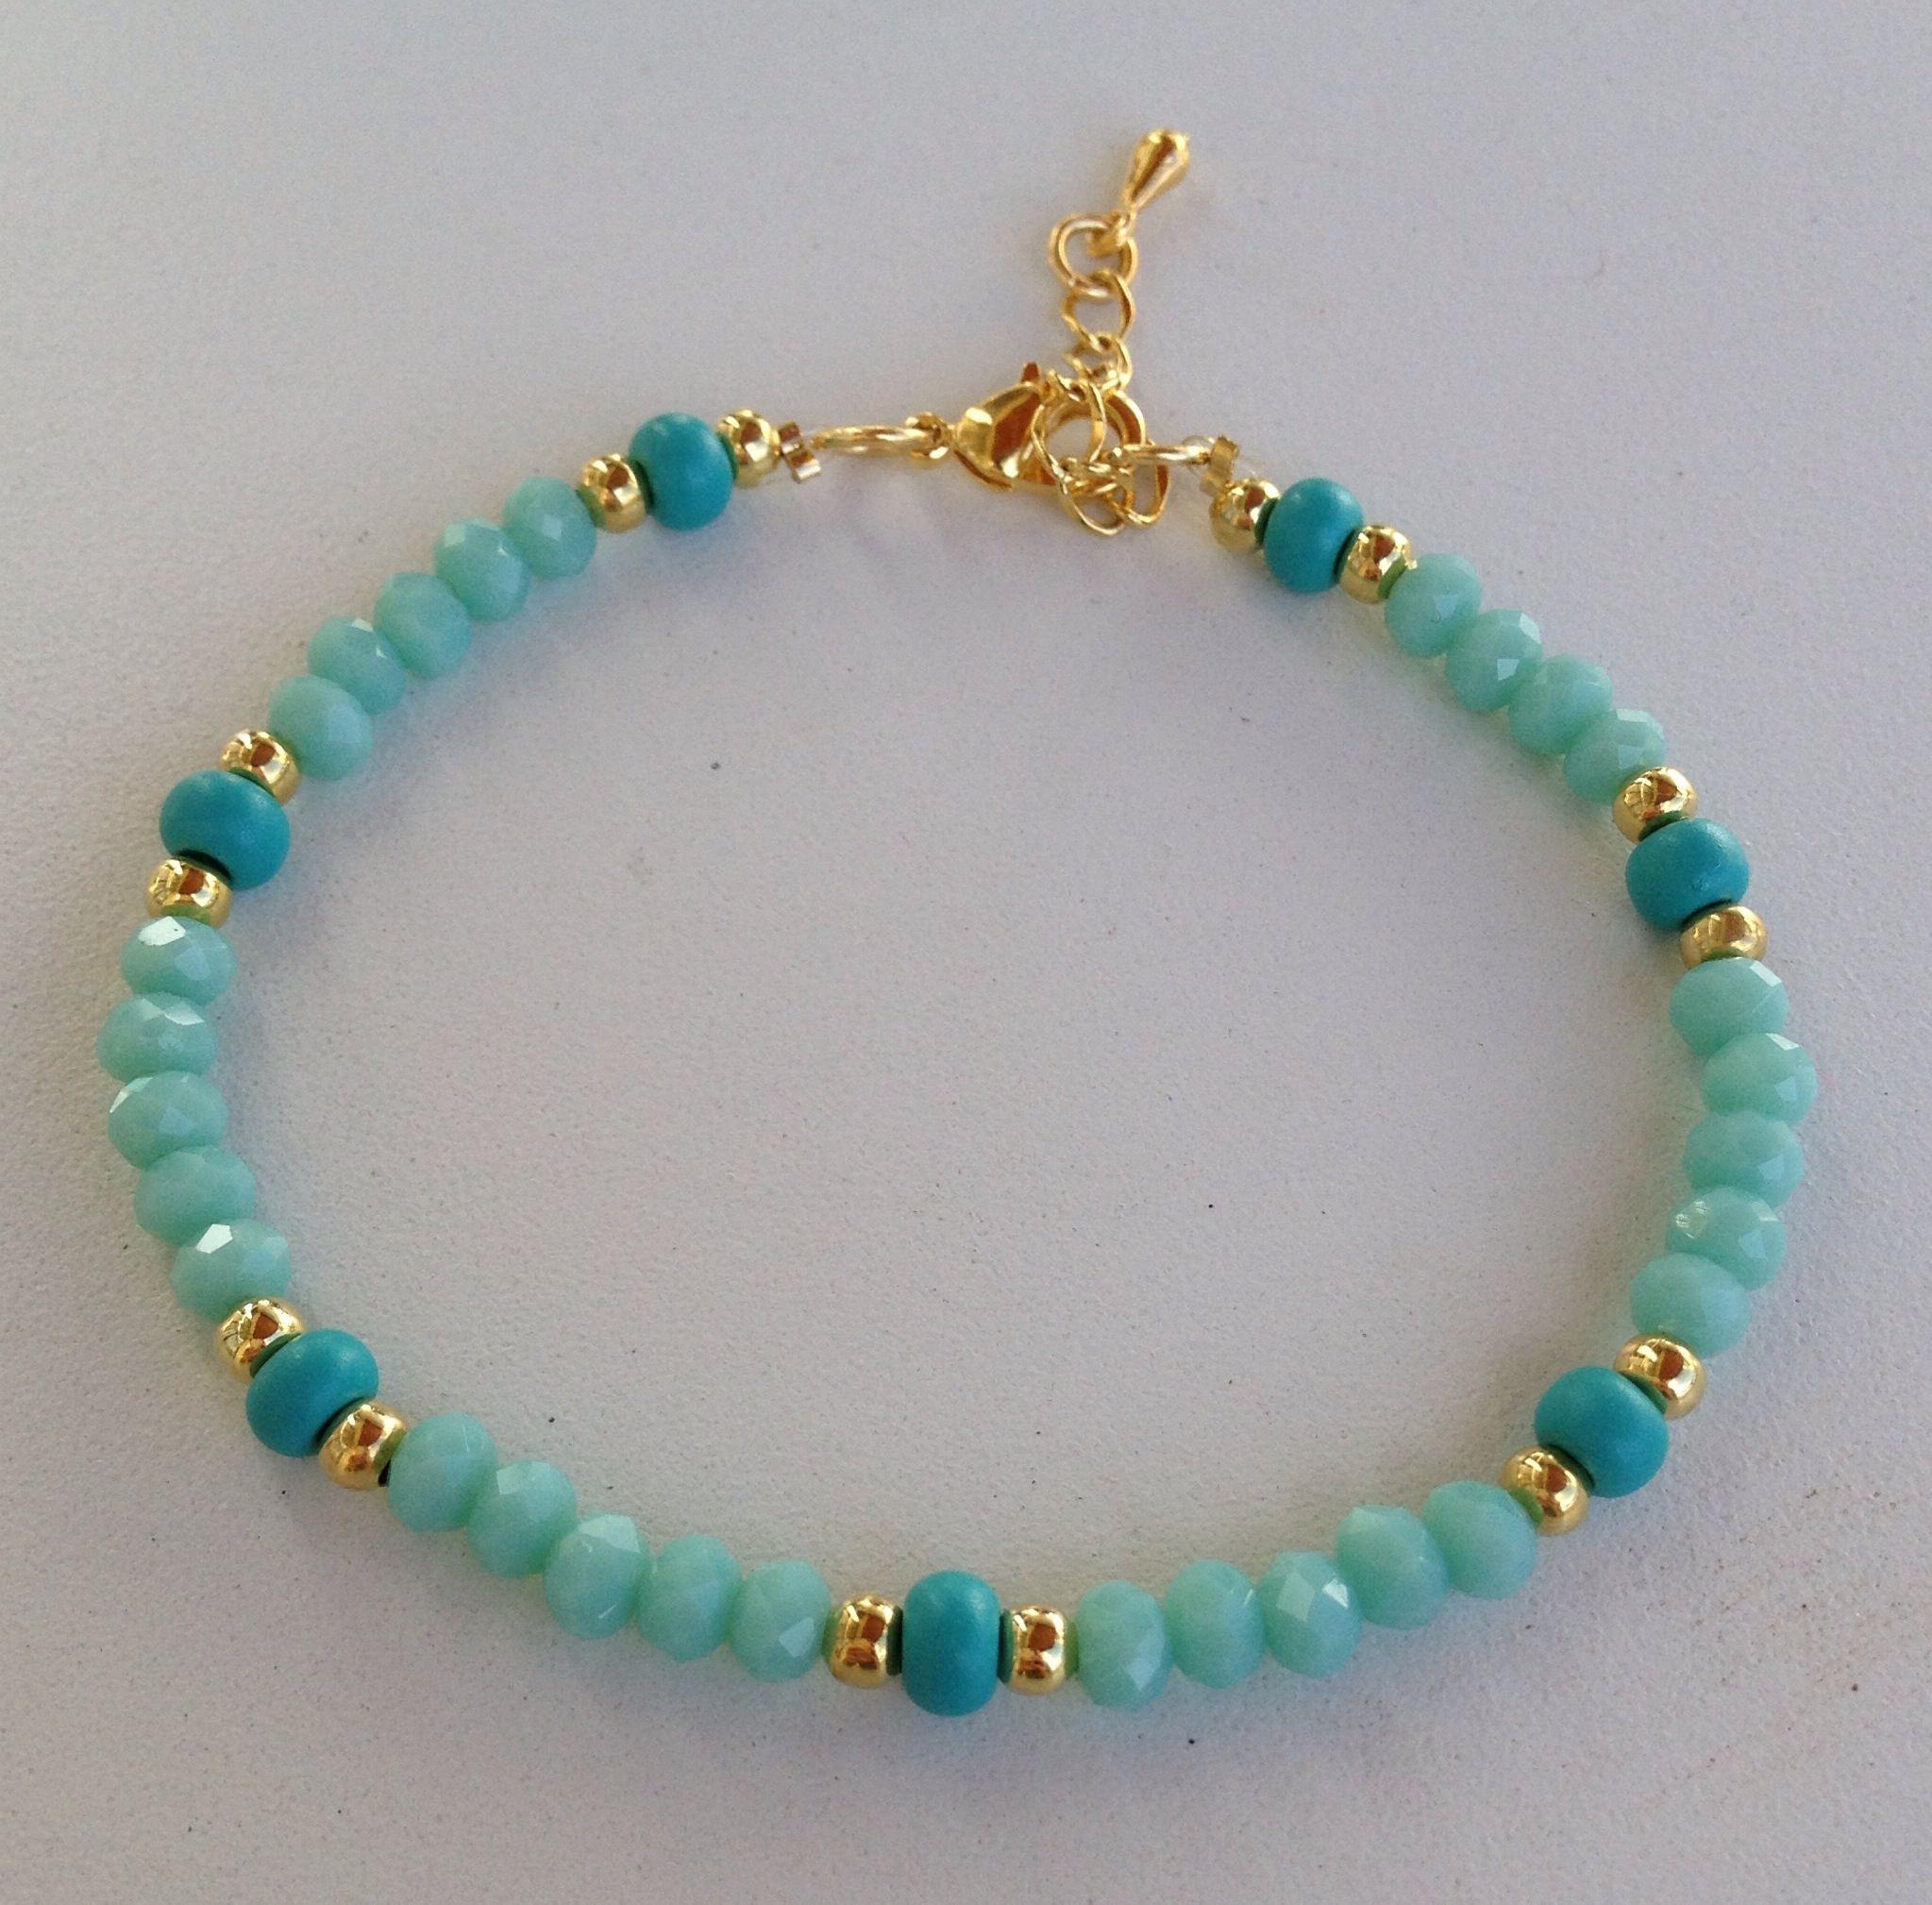 e9c270a38afa Turquoise crystal beaded bracelet pulseira de cristal turquesa   handmadebeadedbracelets